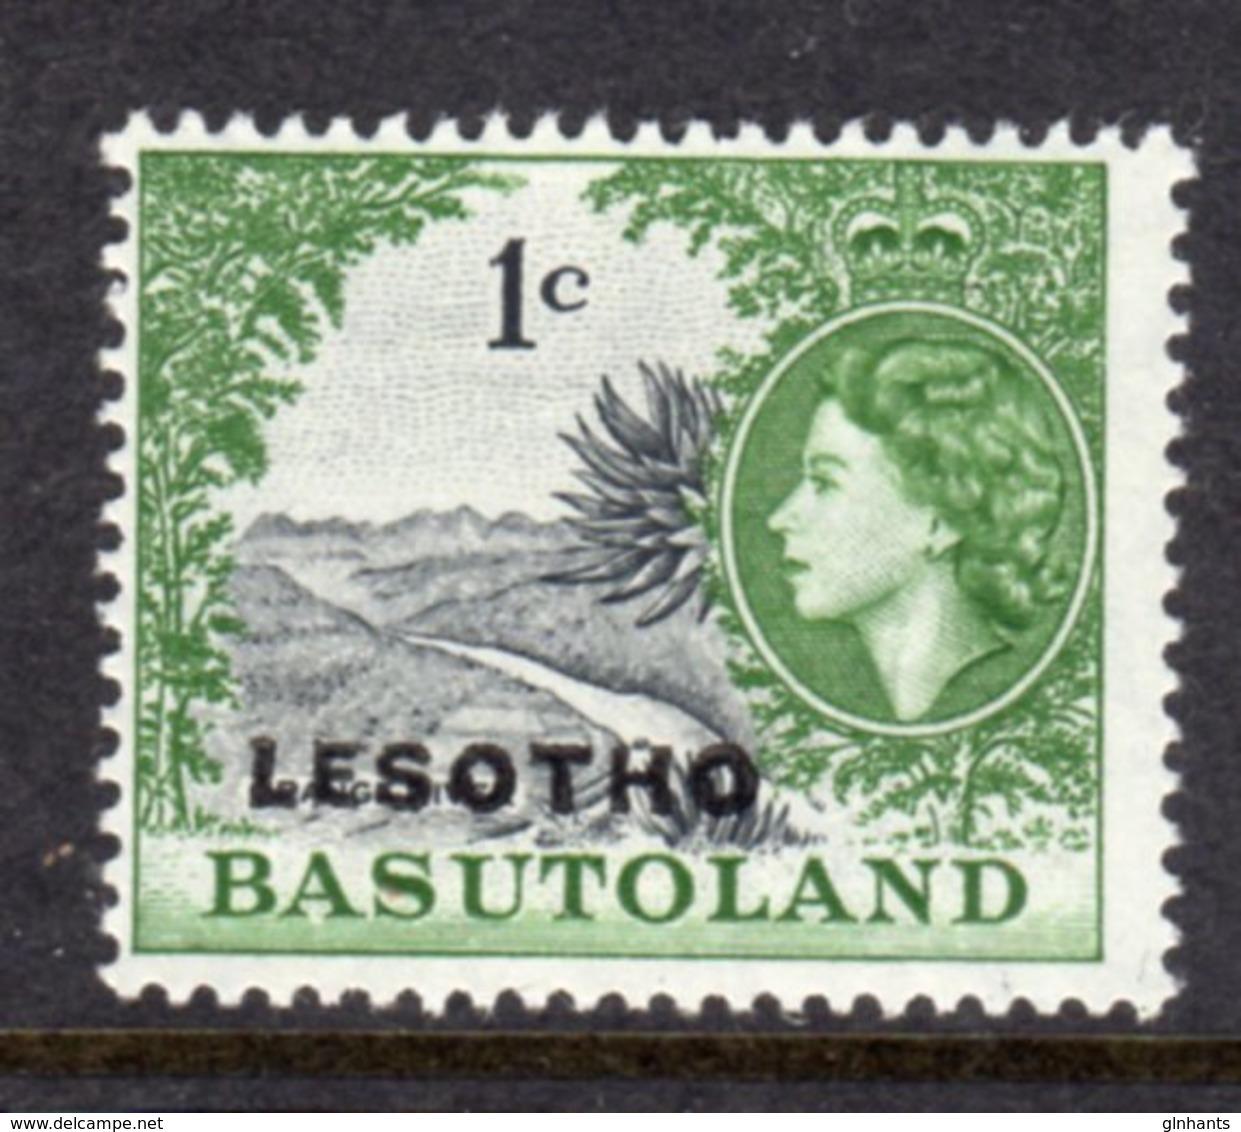 LESOTHO  - 1966 1c DEFINITIVE STAMP WMK BLOCK CA FINE MOUNTED MINT MM * SG 111B - Lesotho (1966-...)